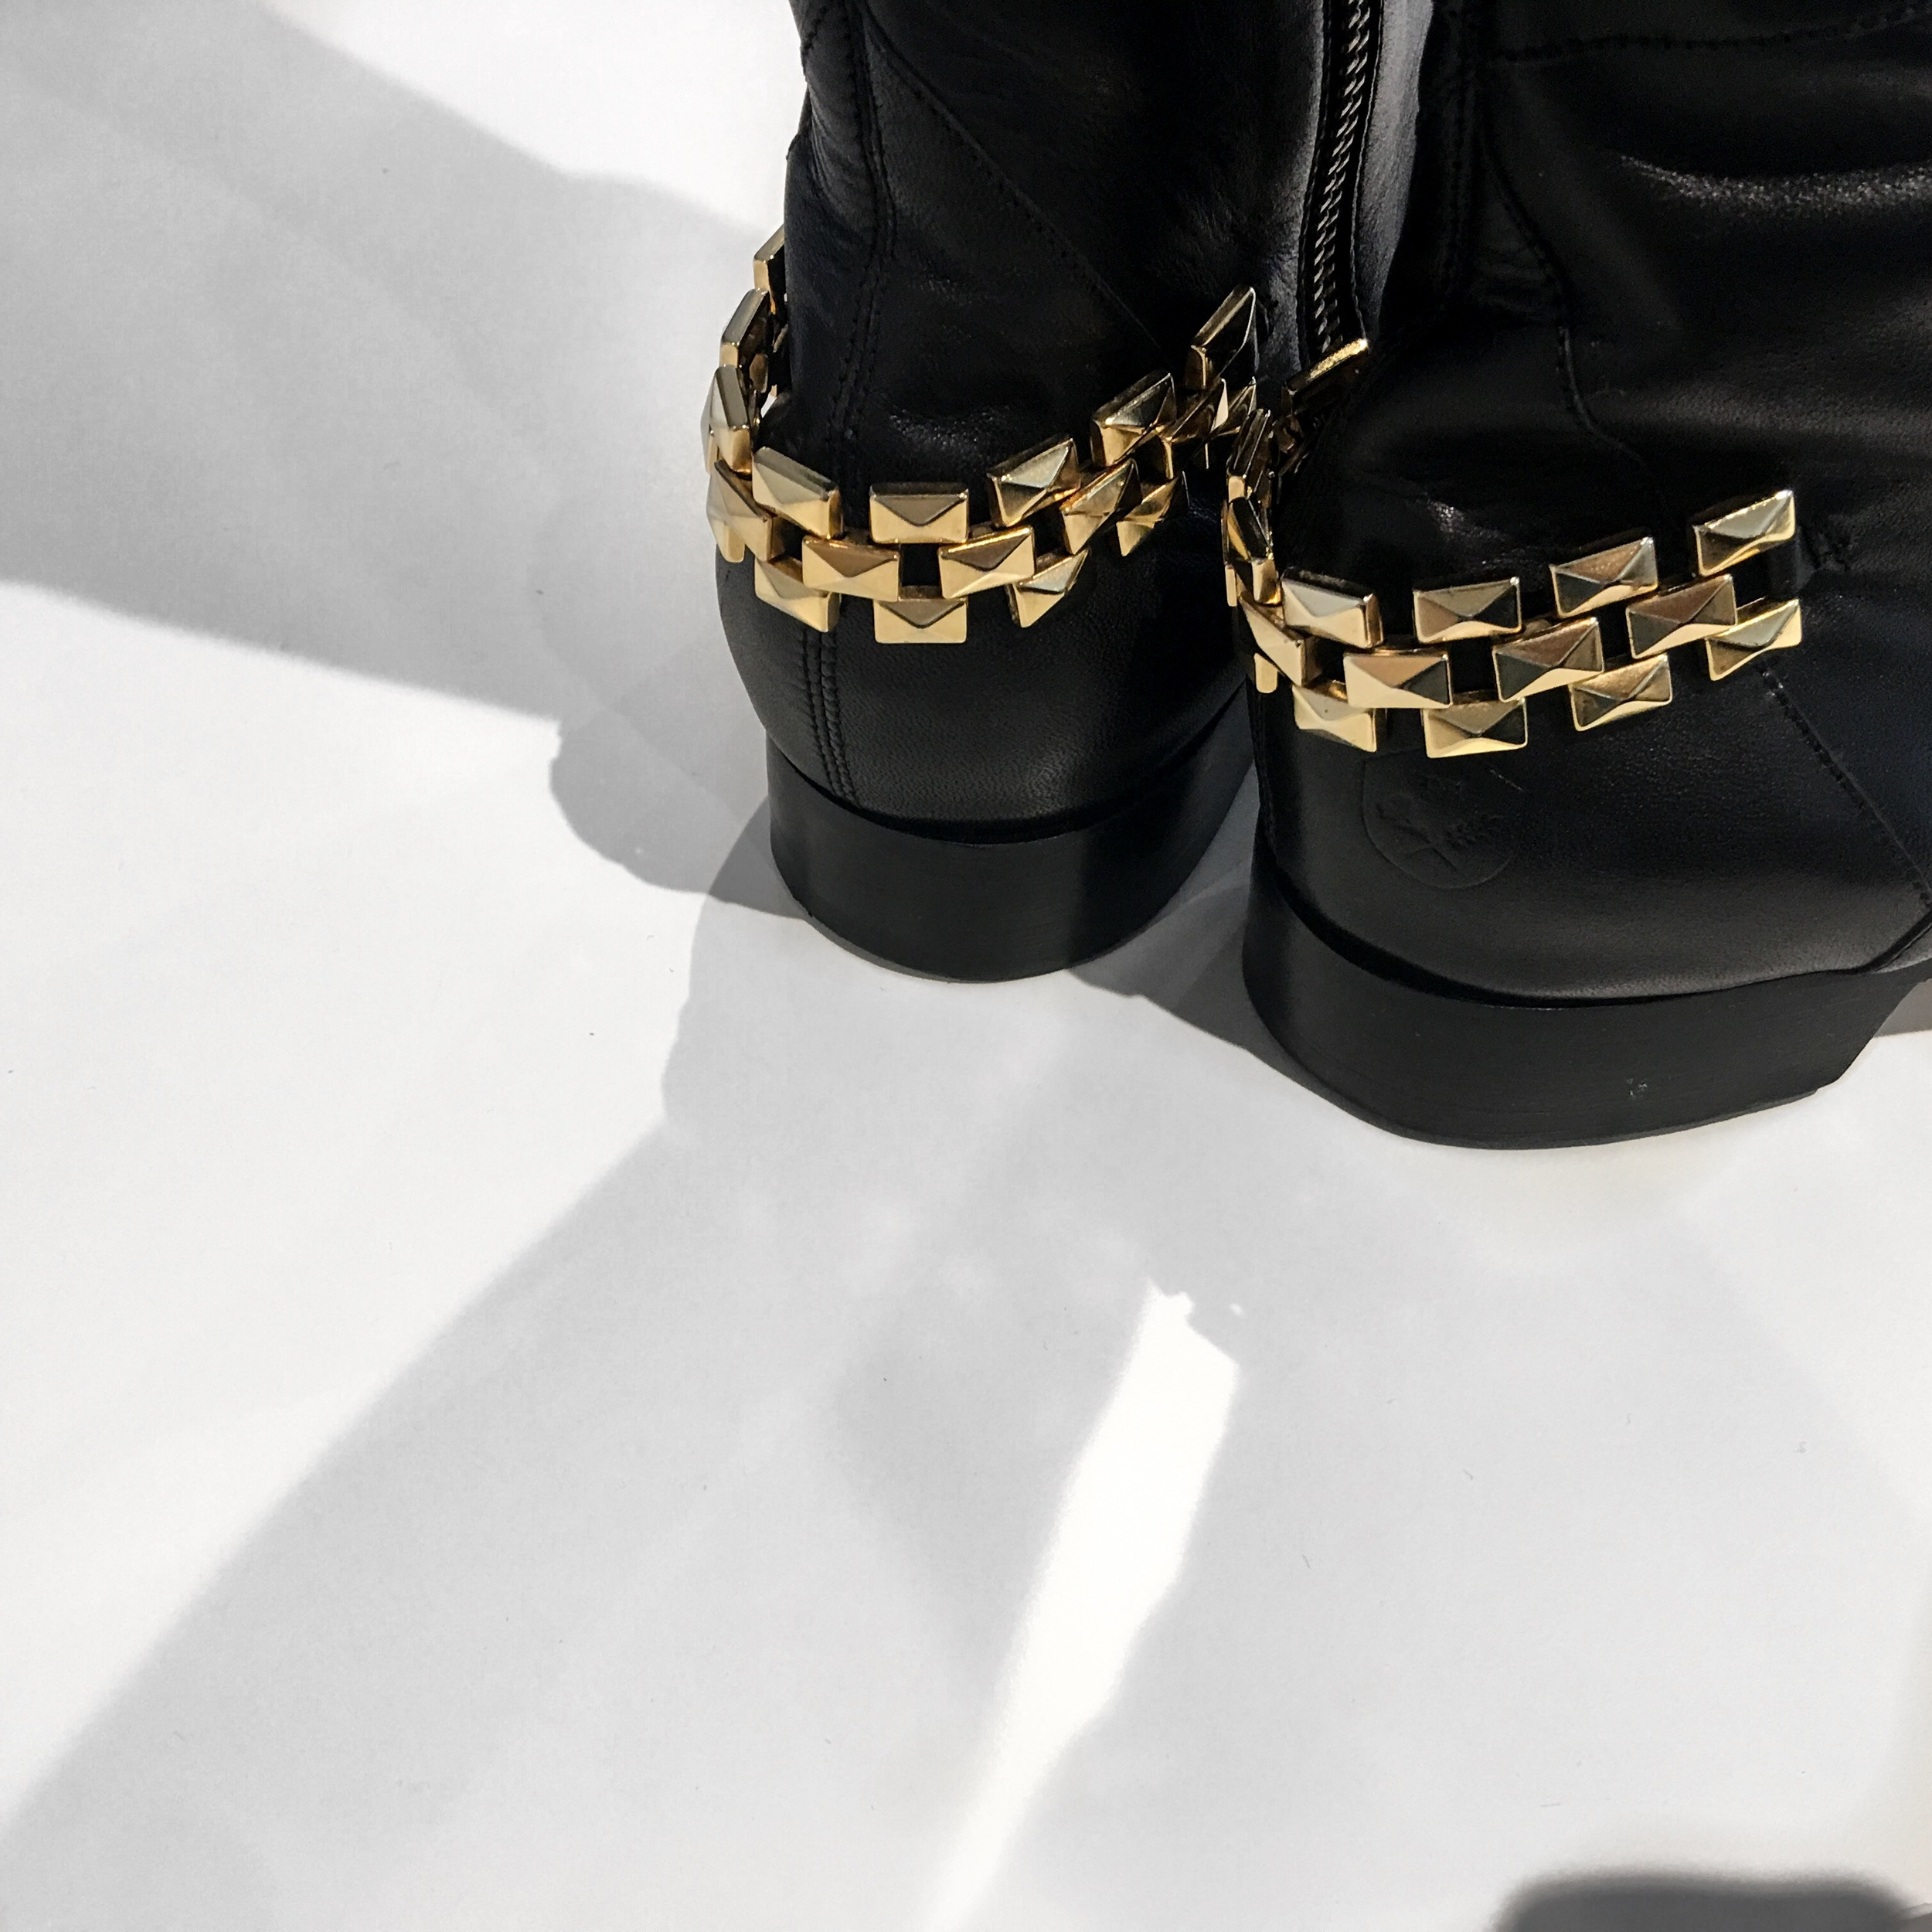 Poppy Barley chain boot